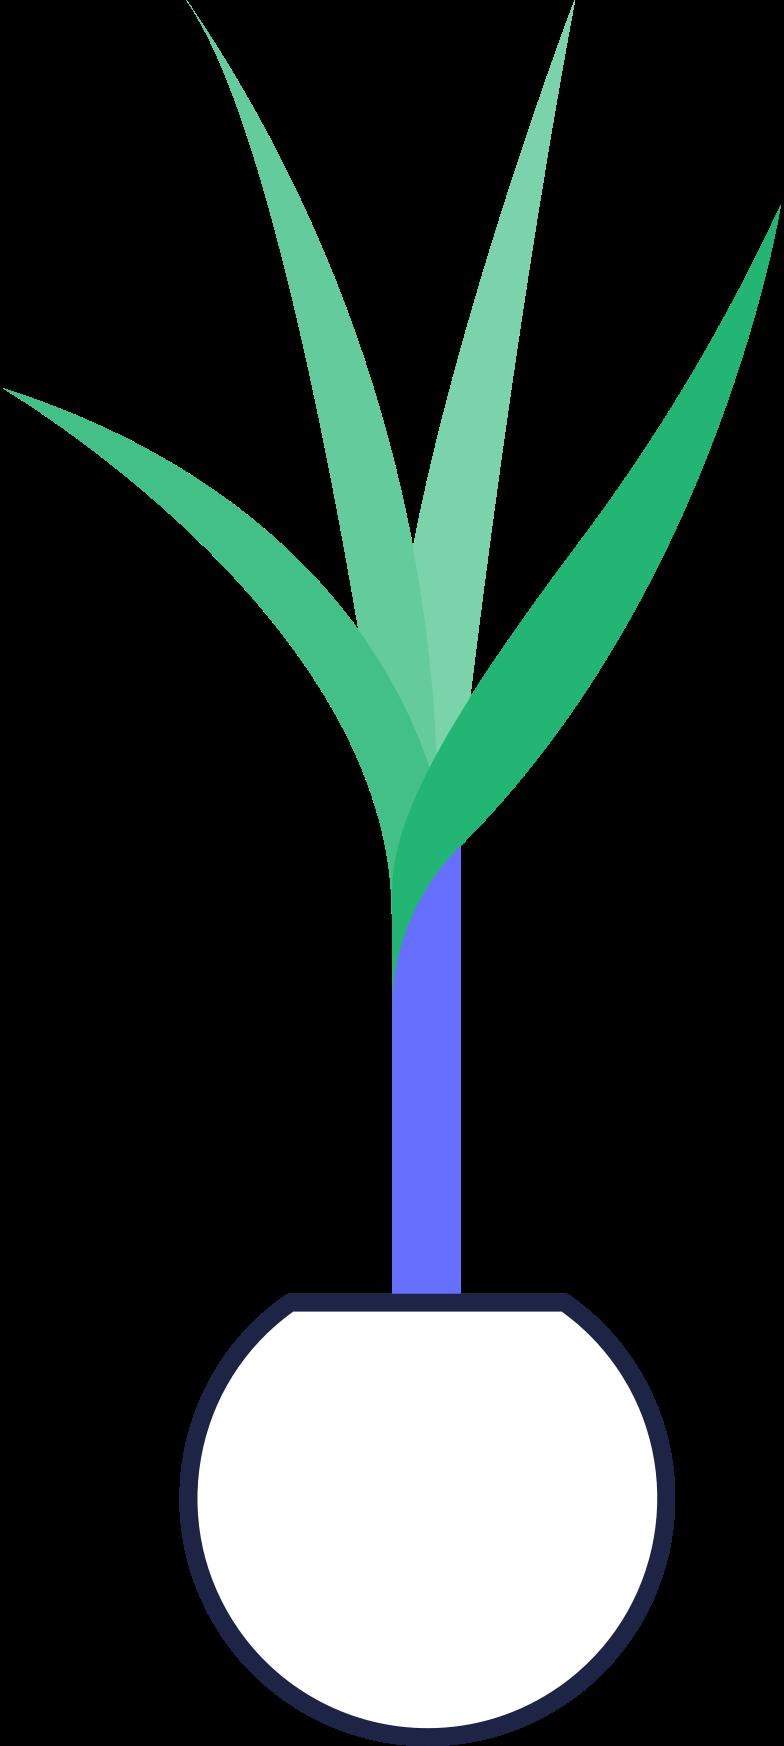 education  plant room line Clipart illustration in PNG, SVG